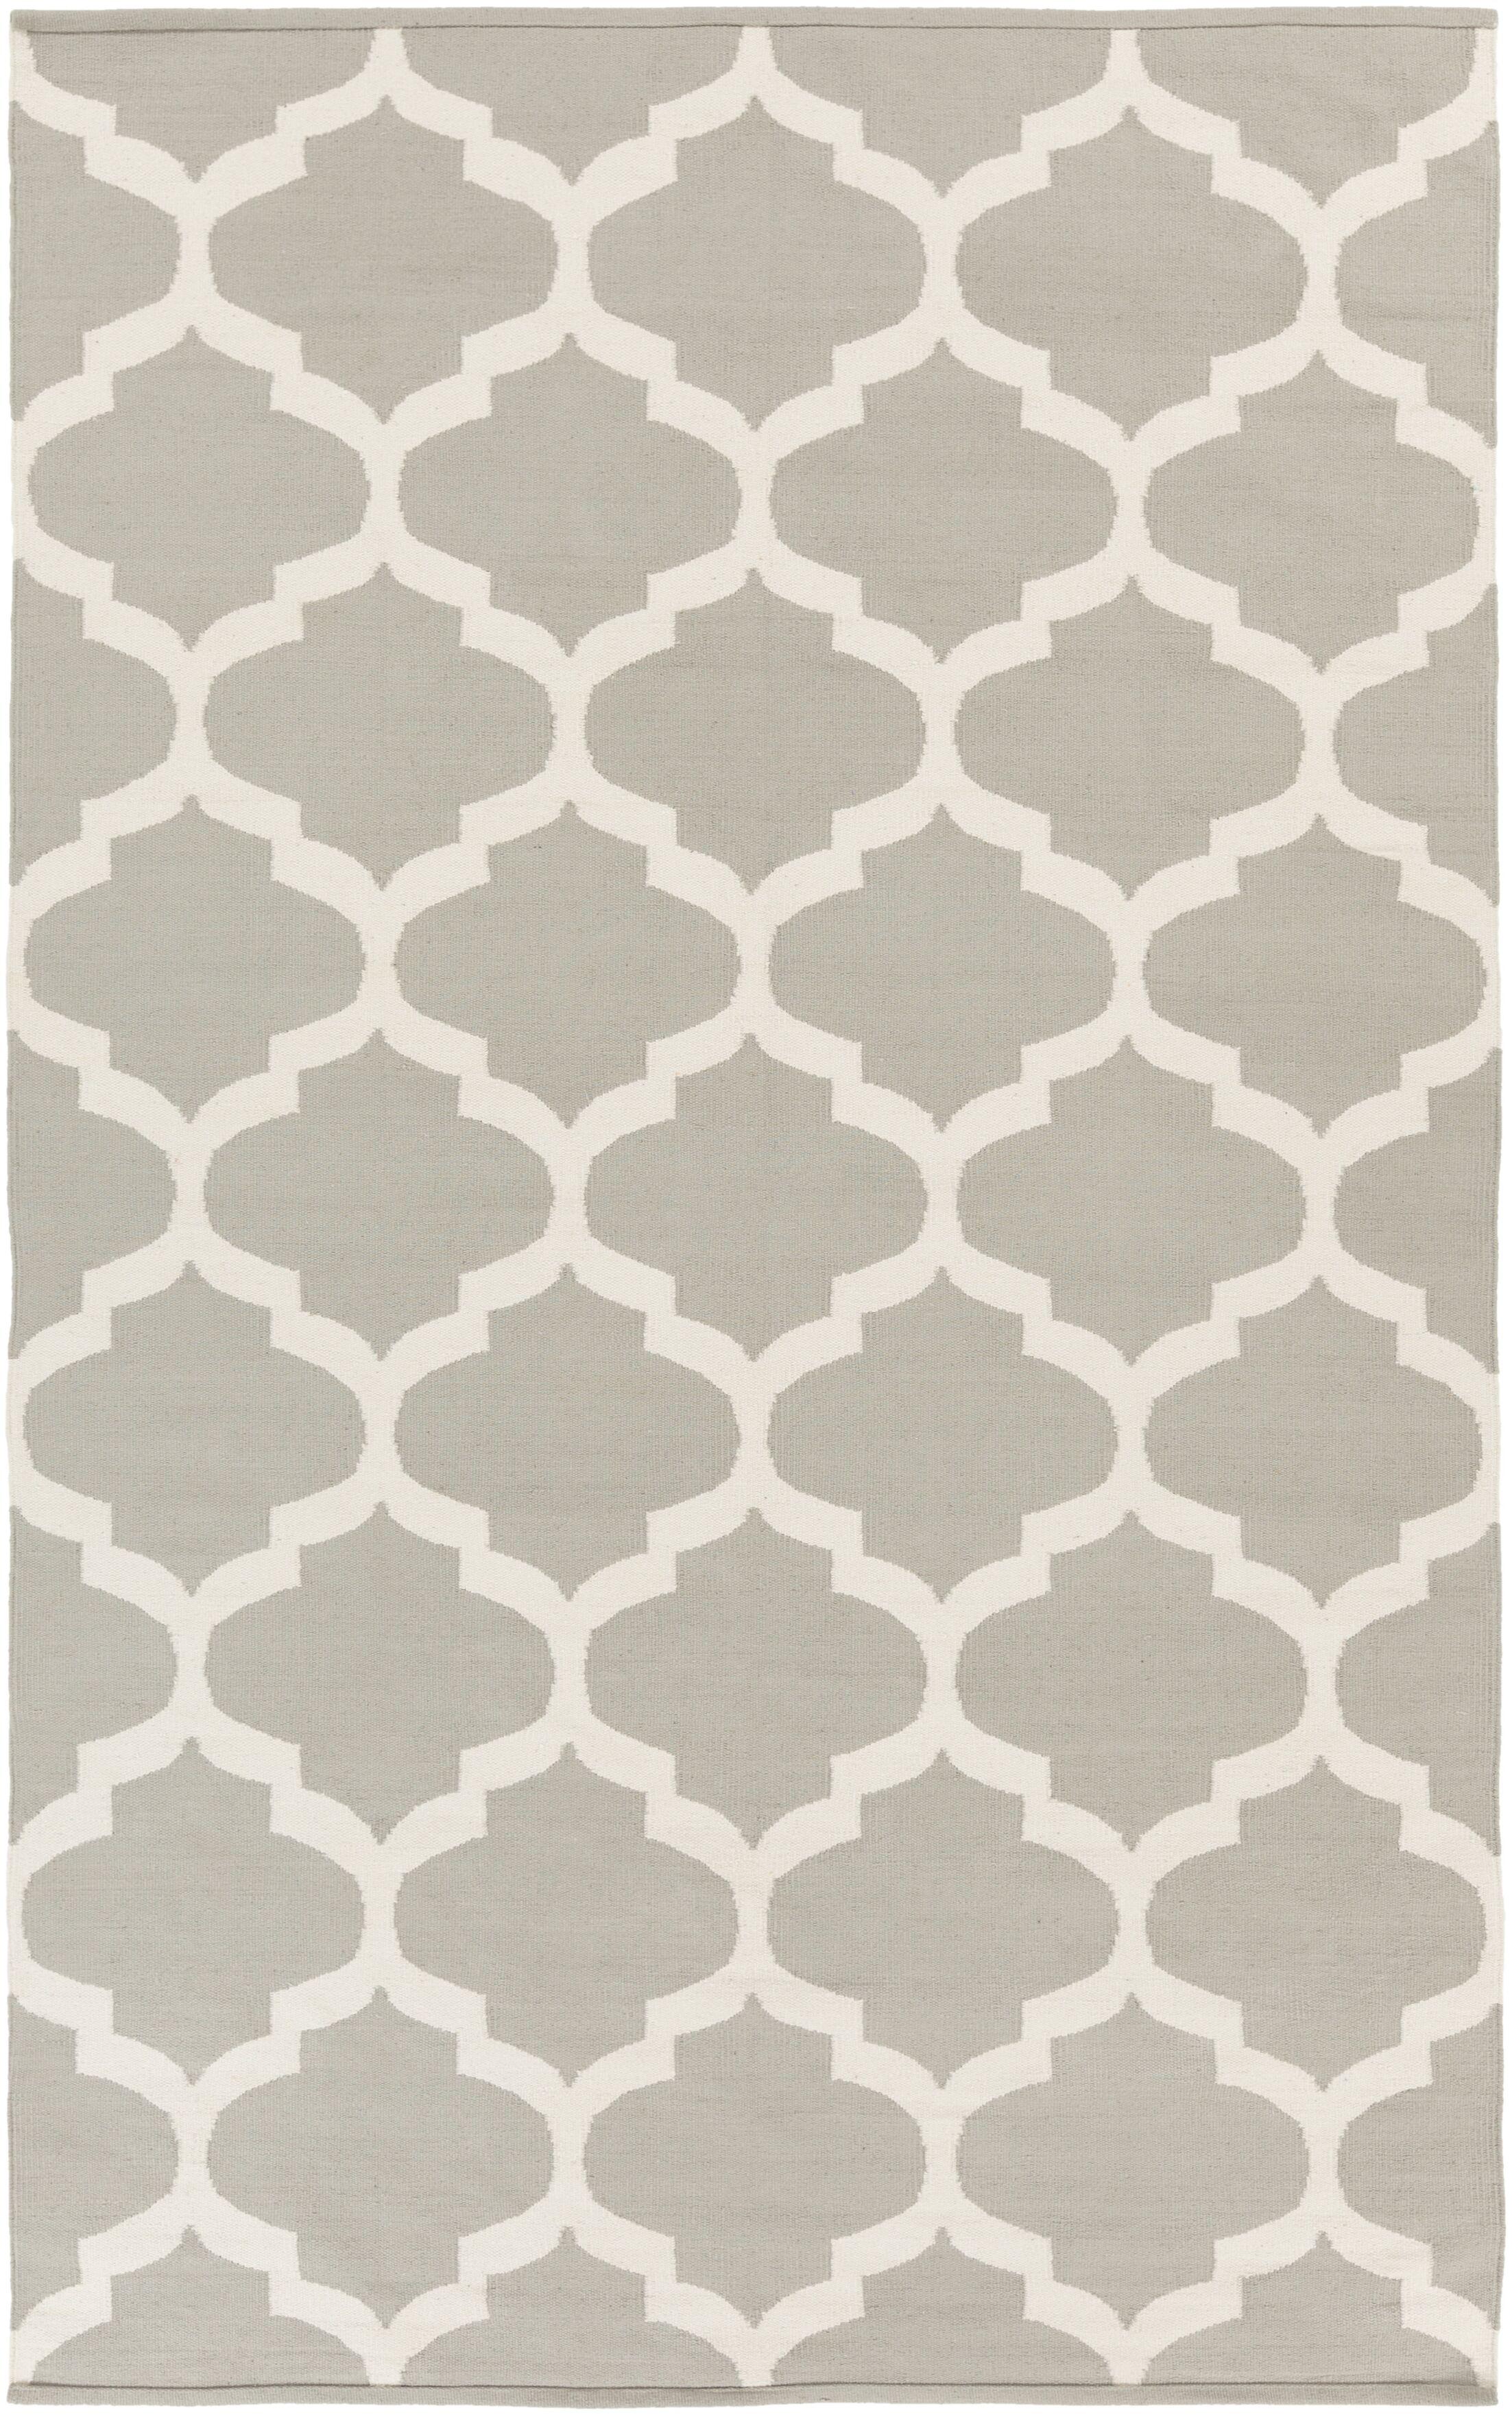 Bohannon Gray Geometric Area Rug Rug Size: Rectangle 8' x 10'